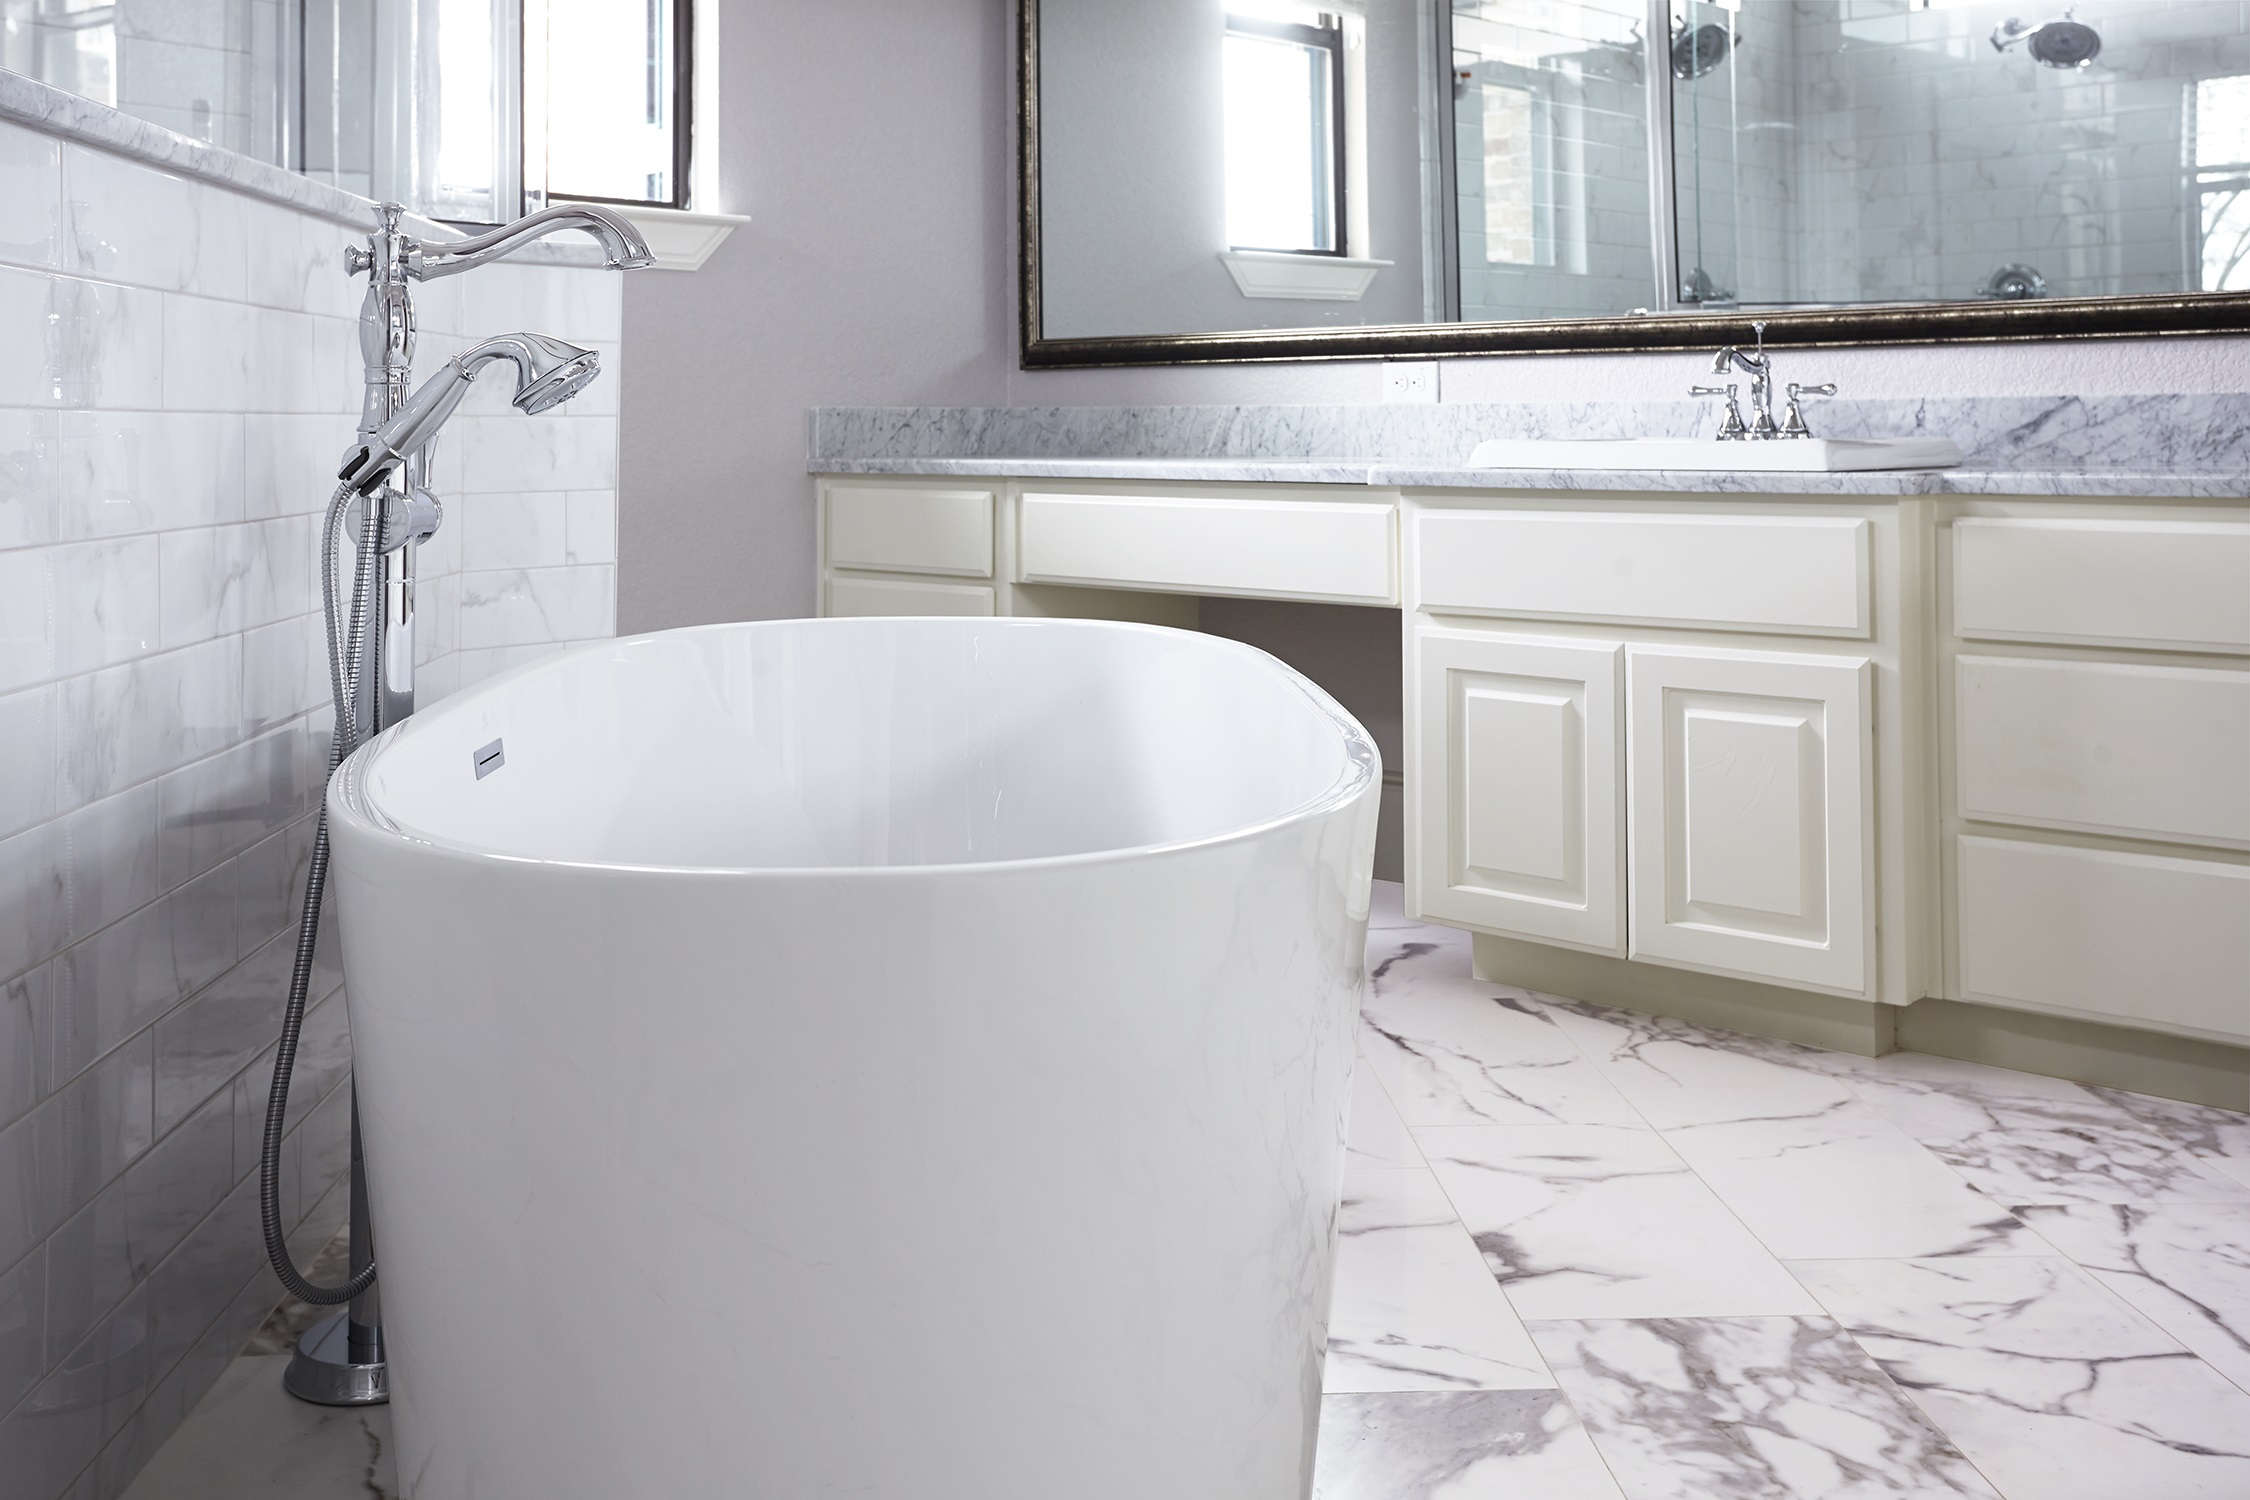 Bath1_PSG_004.jpg